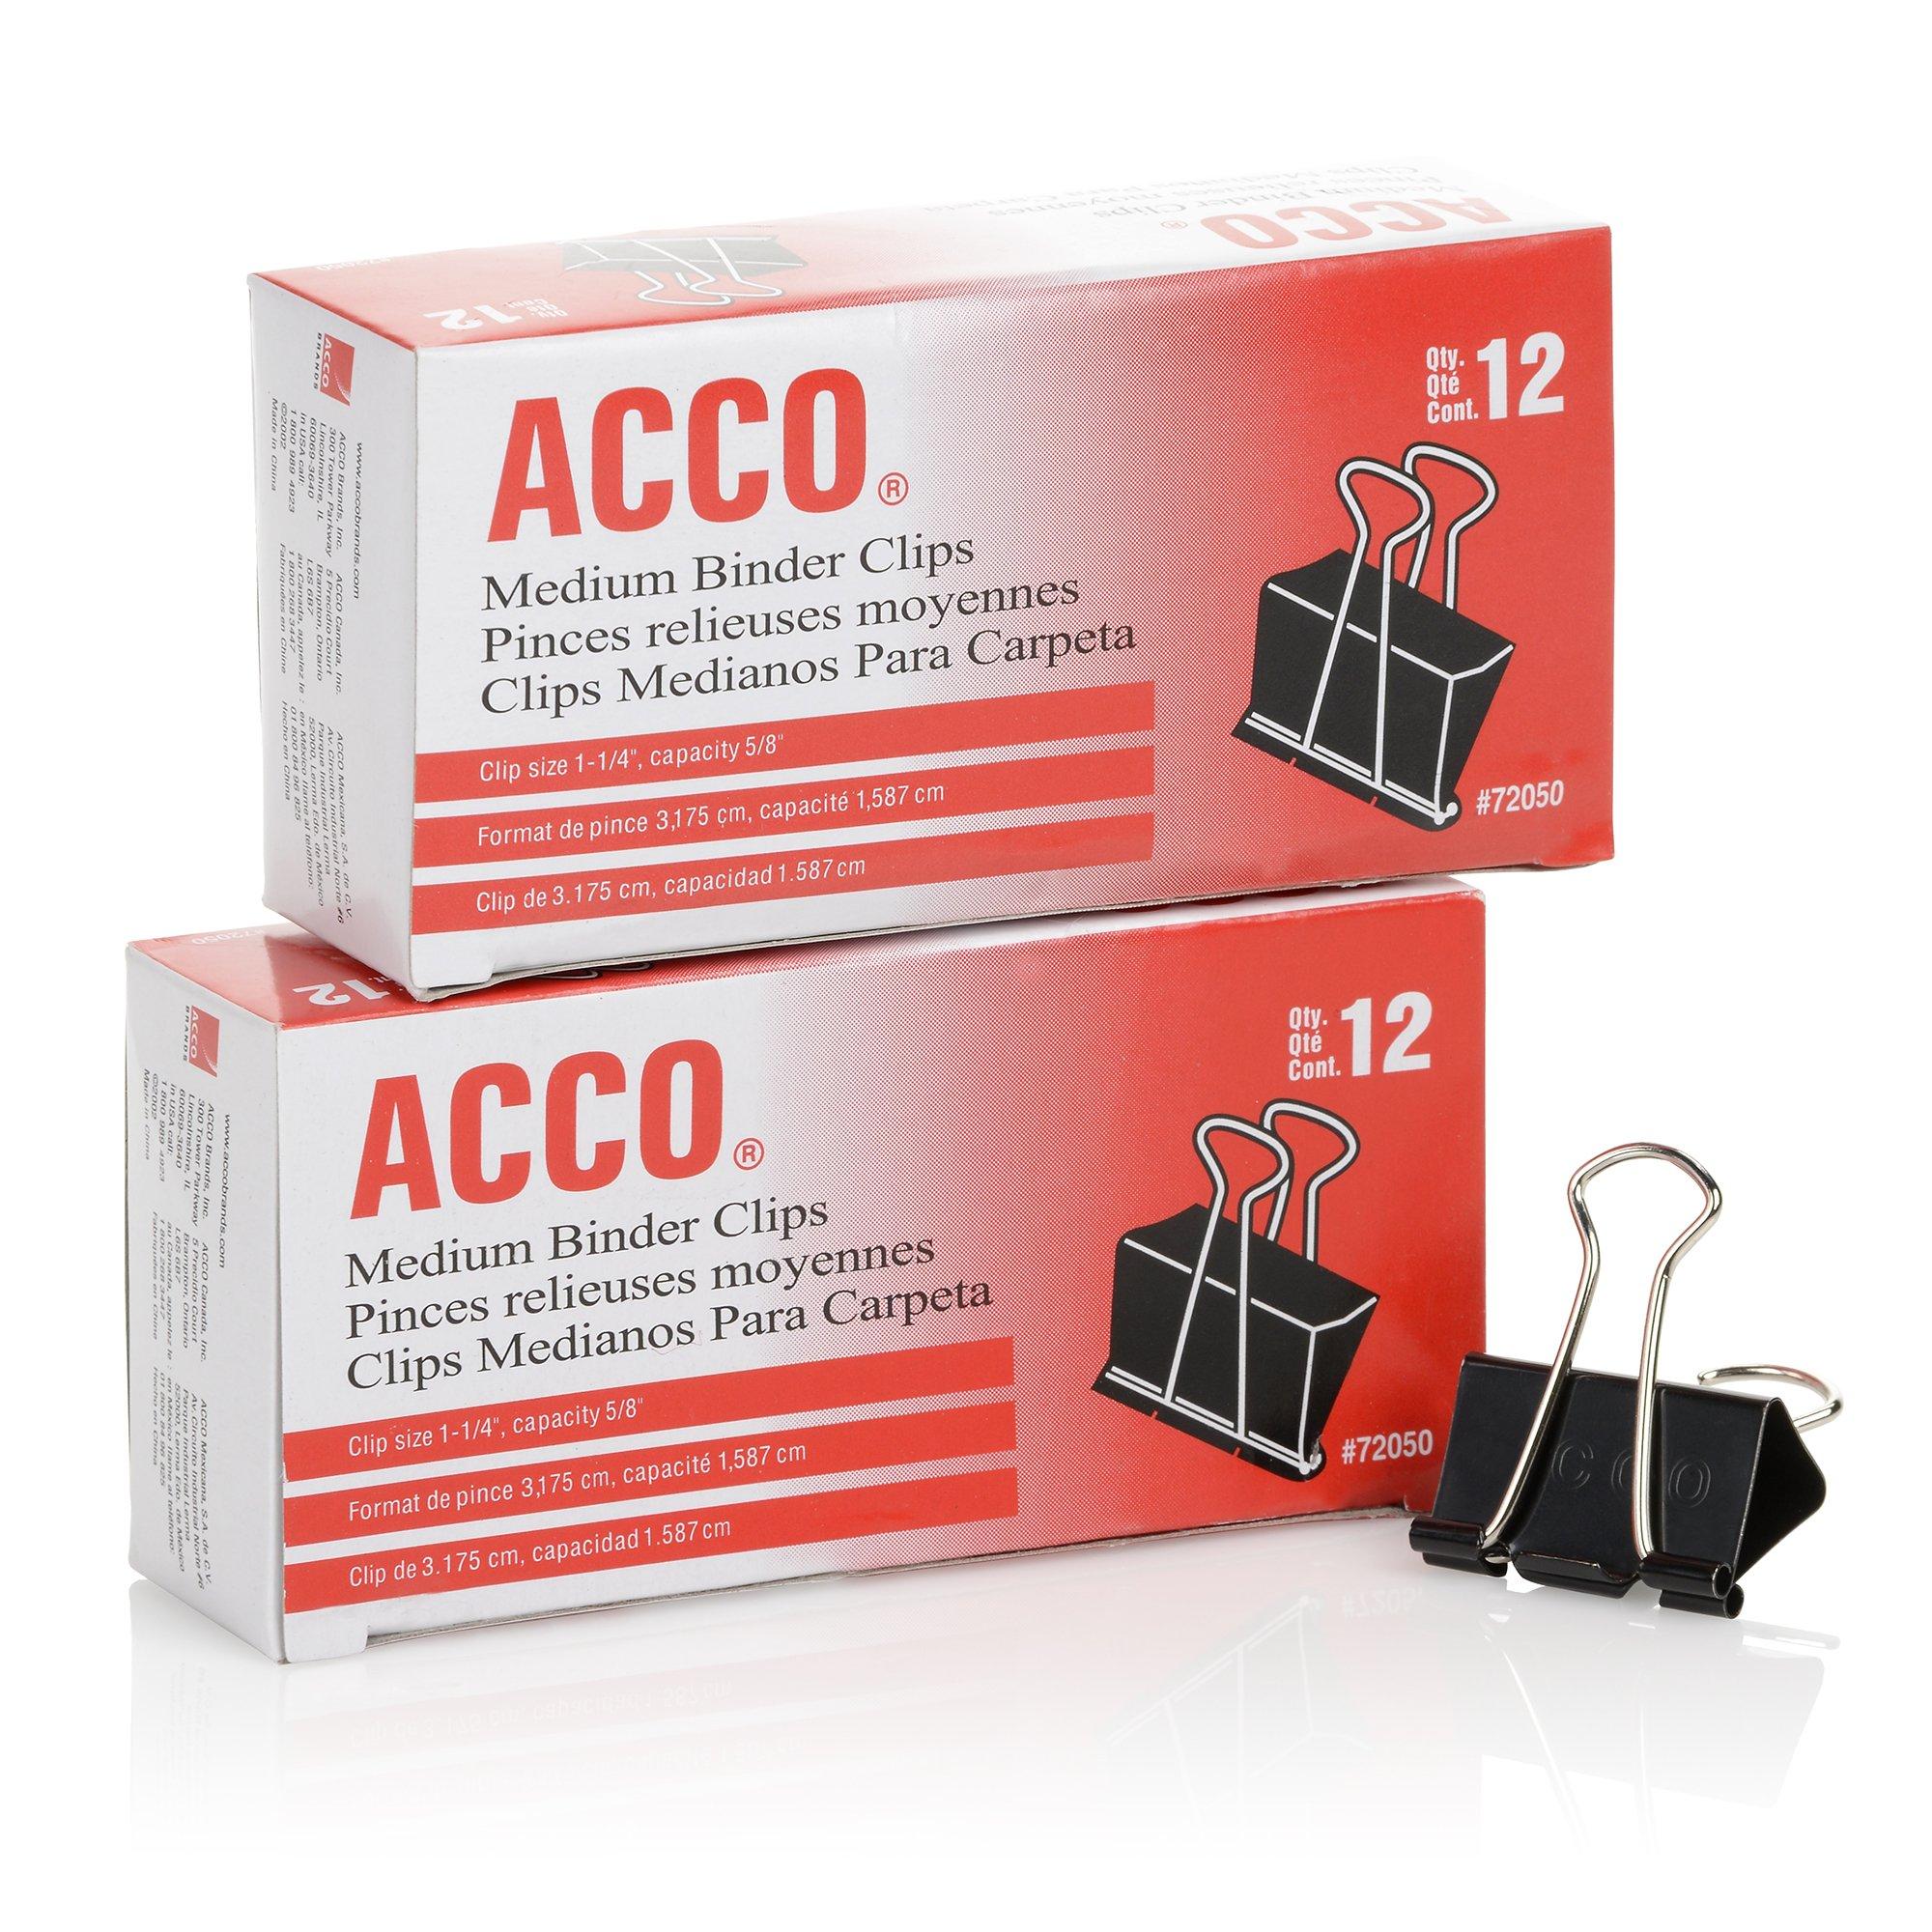 Acco Brands Binder Clips Medium 12 Per Box 2 Boxes